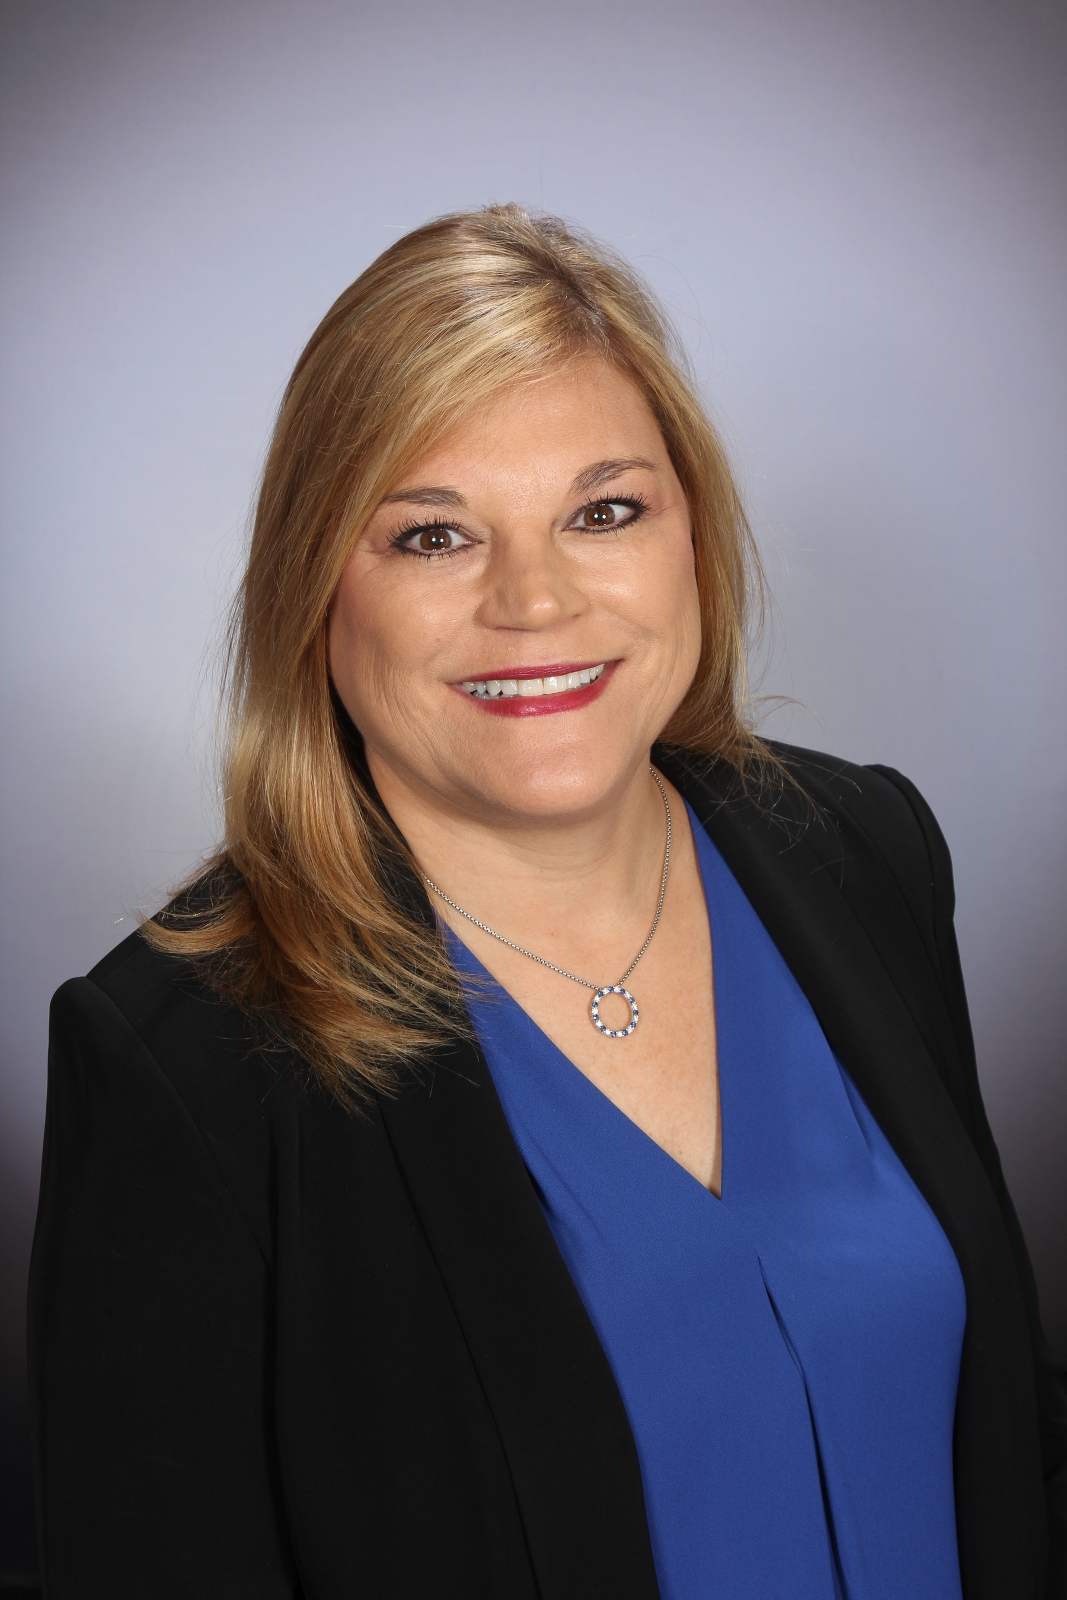 Marcia Walker, Director of Food Innovation, 915 Labs